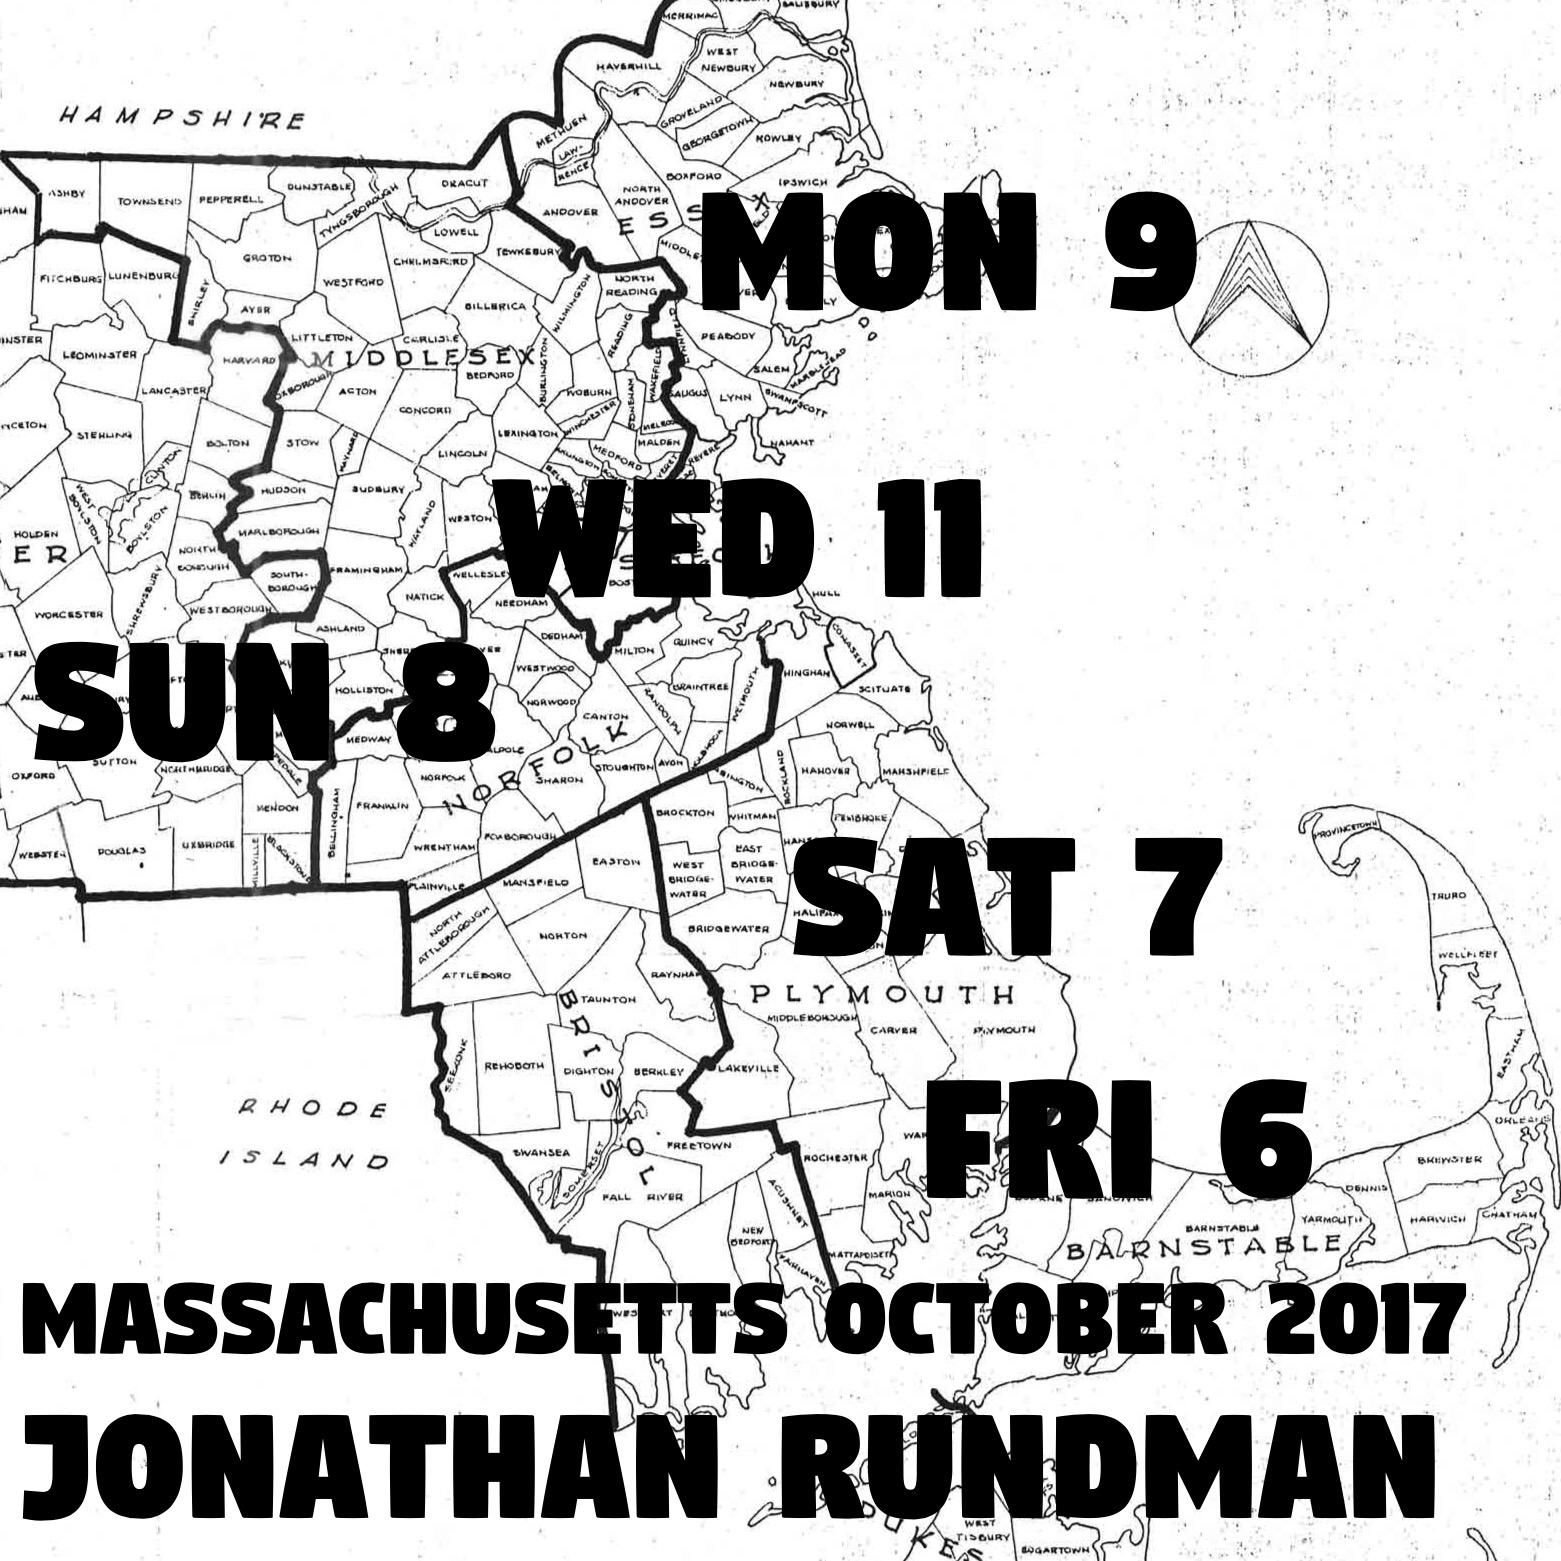 NEW ENGLAND! - FRIDAY, OCT 6, 7PMFirst Lutheran ChurchWest Barnstable, MA (Cape Cod)SATURDAY, OCT 7, 7PMThe Loring CenterPlymouth, MASUNDAY, OCT 8Good Shepherd Lutheran ChurchWestborough, MAMONDAY, OCT 9, 7PMSt. Paul Lutheran ChurchGloucester, MAWEDNESDAY, OCT 11, 7PMPayson Park UCC ChurchBelmont, MA (Boston Metro)